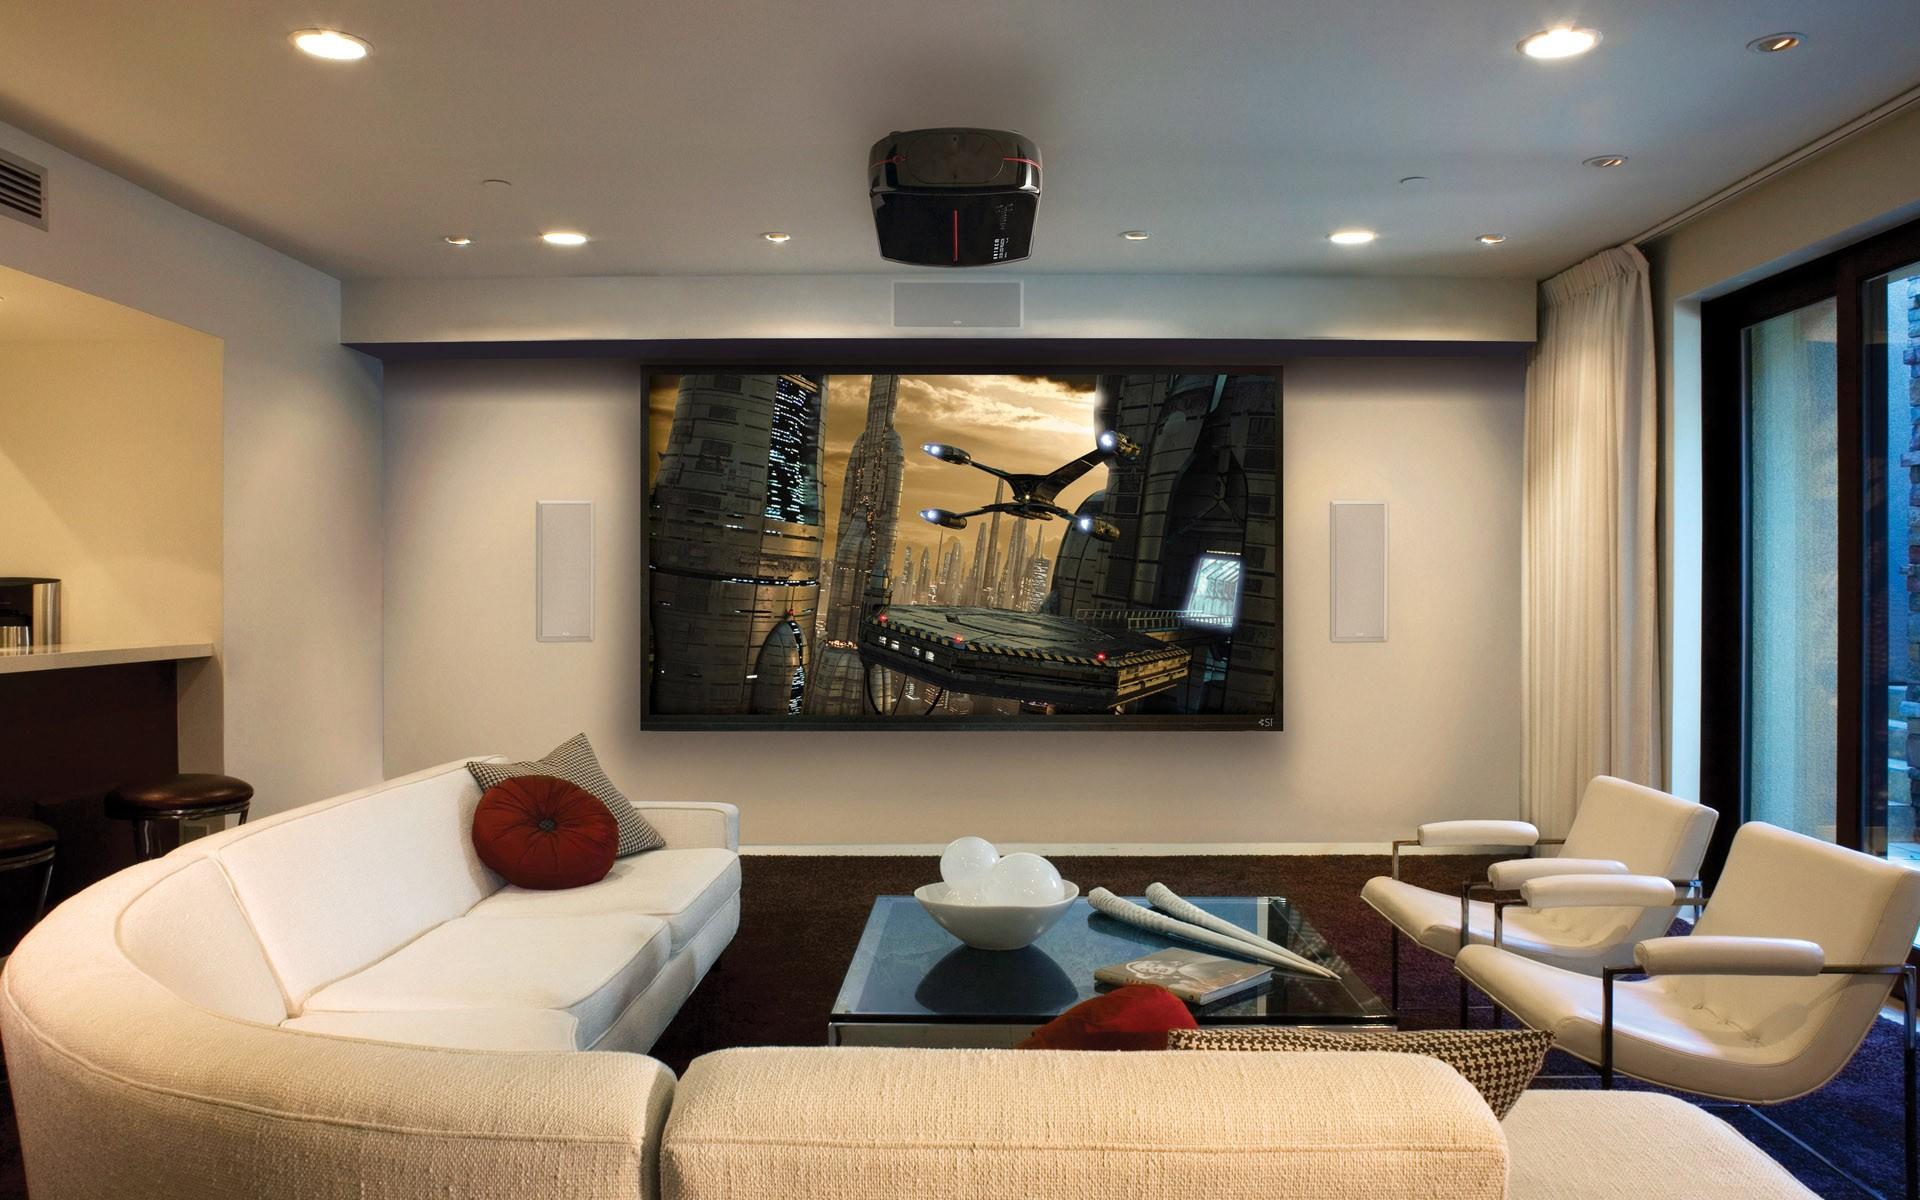 Hermosa sala para ver películas - 1920x1200